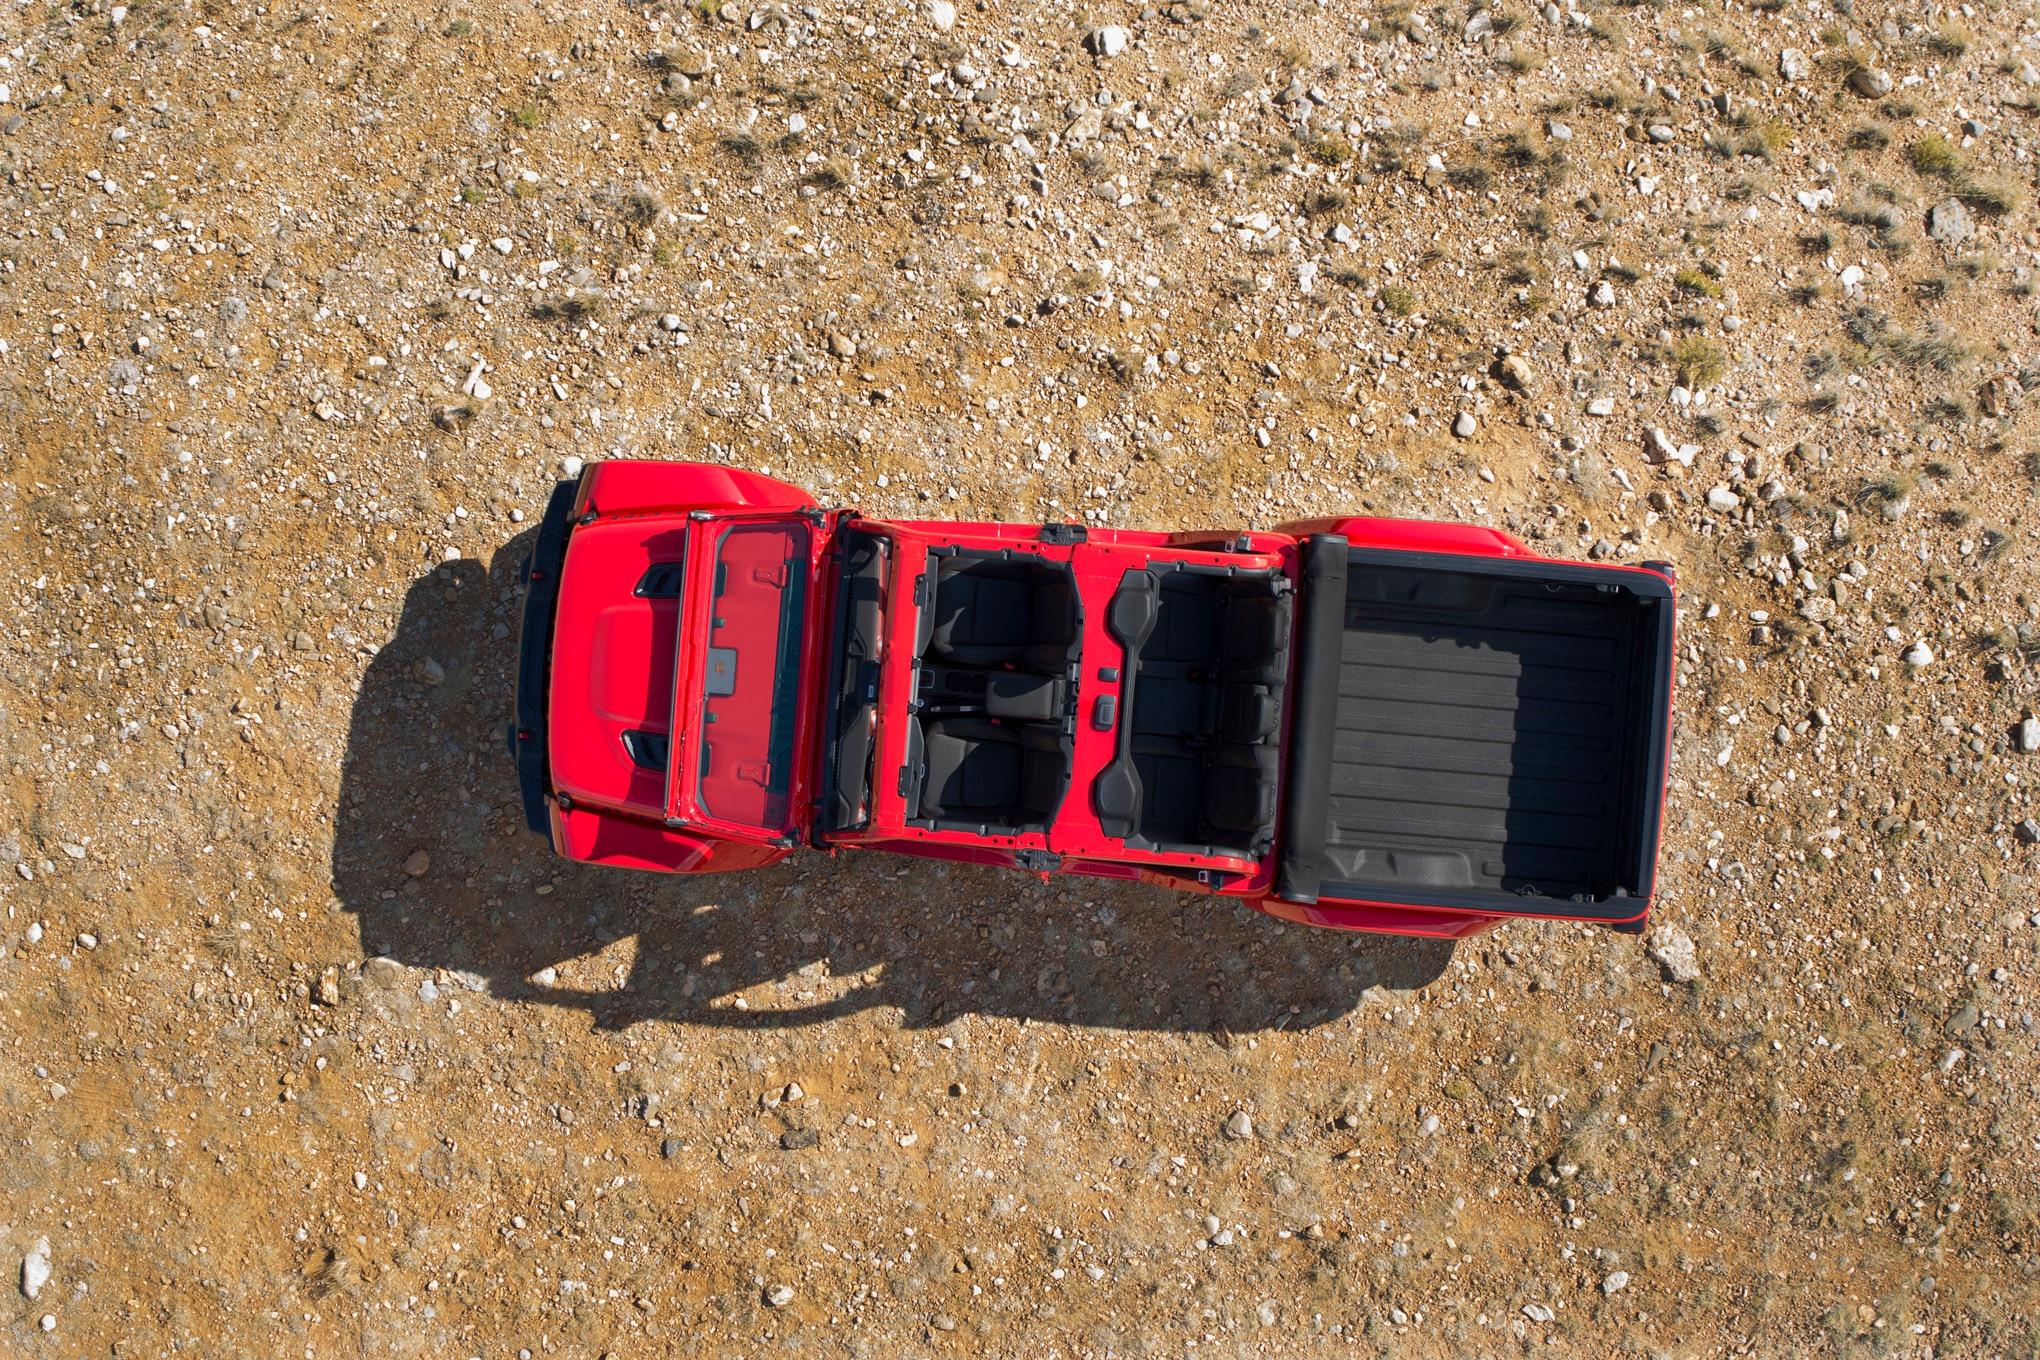 025 auto news four wheeler 2020 jeep gladiator aerial